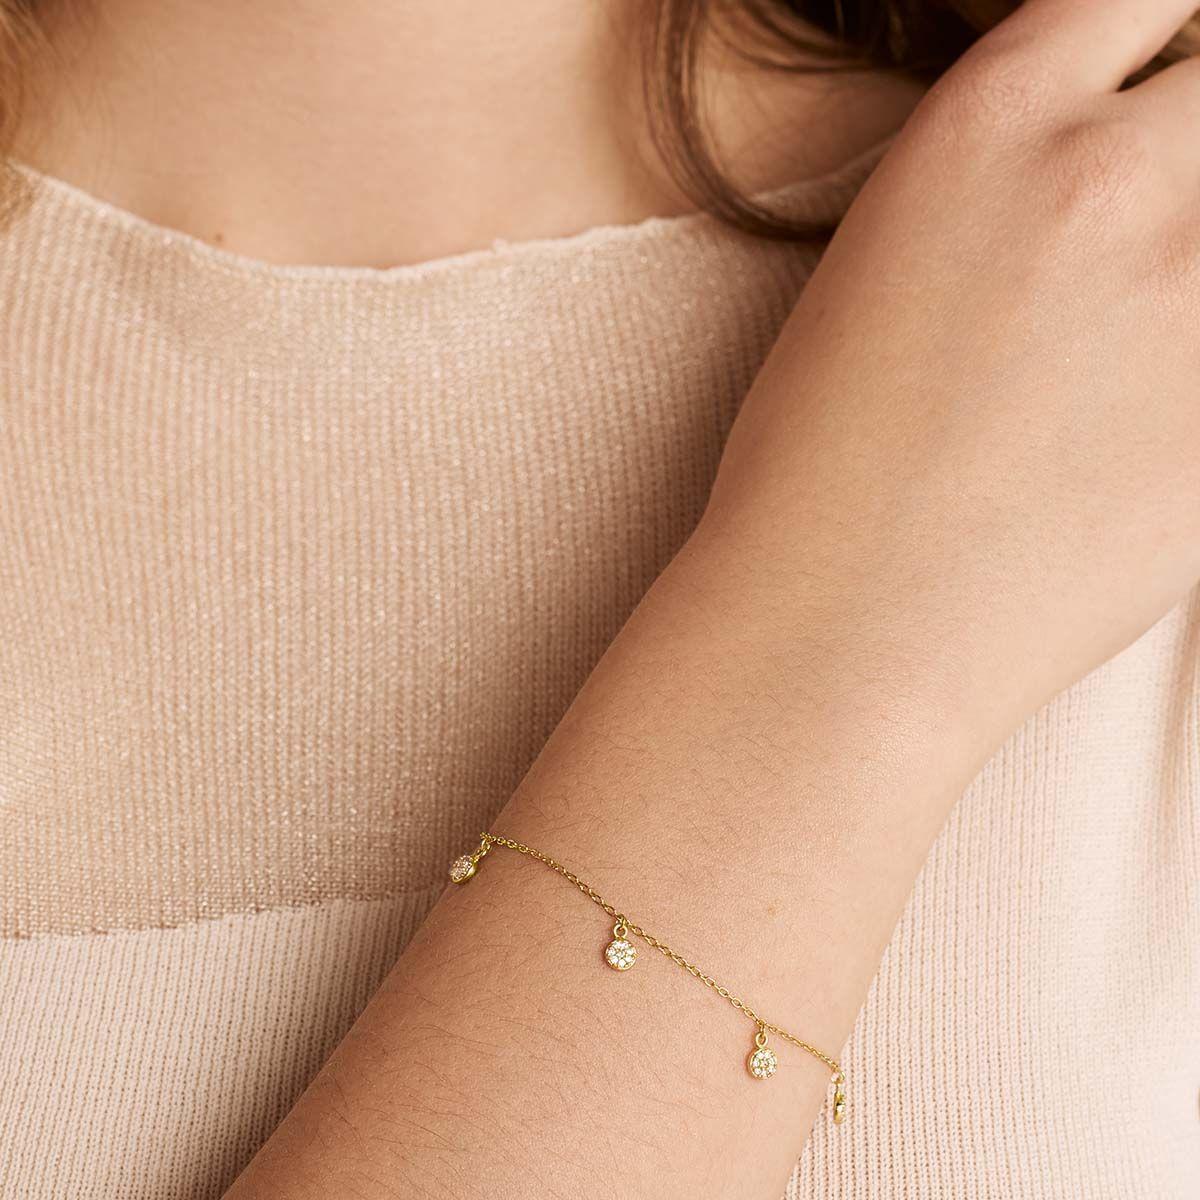 Celeste - Armband - 18k vergoldet